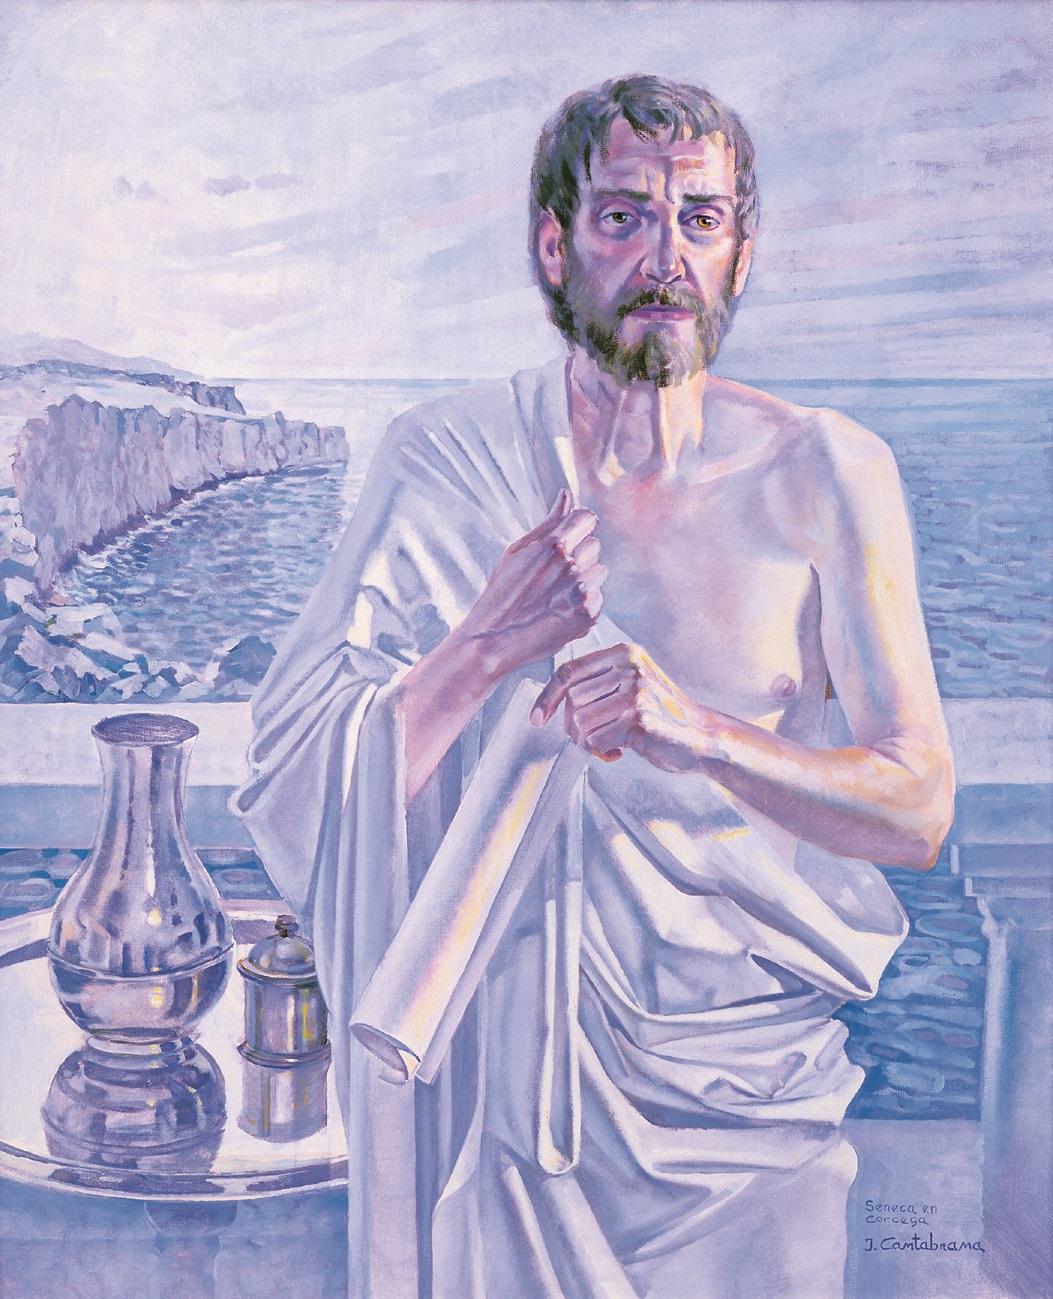 Seneca en Corcega oleo sobre lienzo 92x73 cm